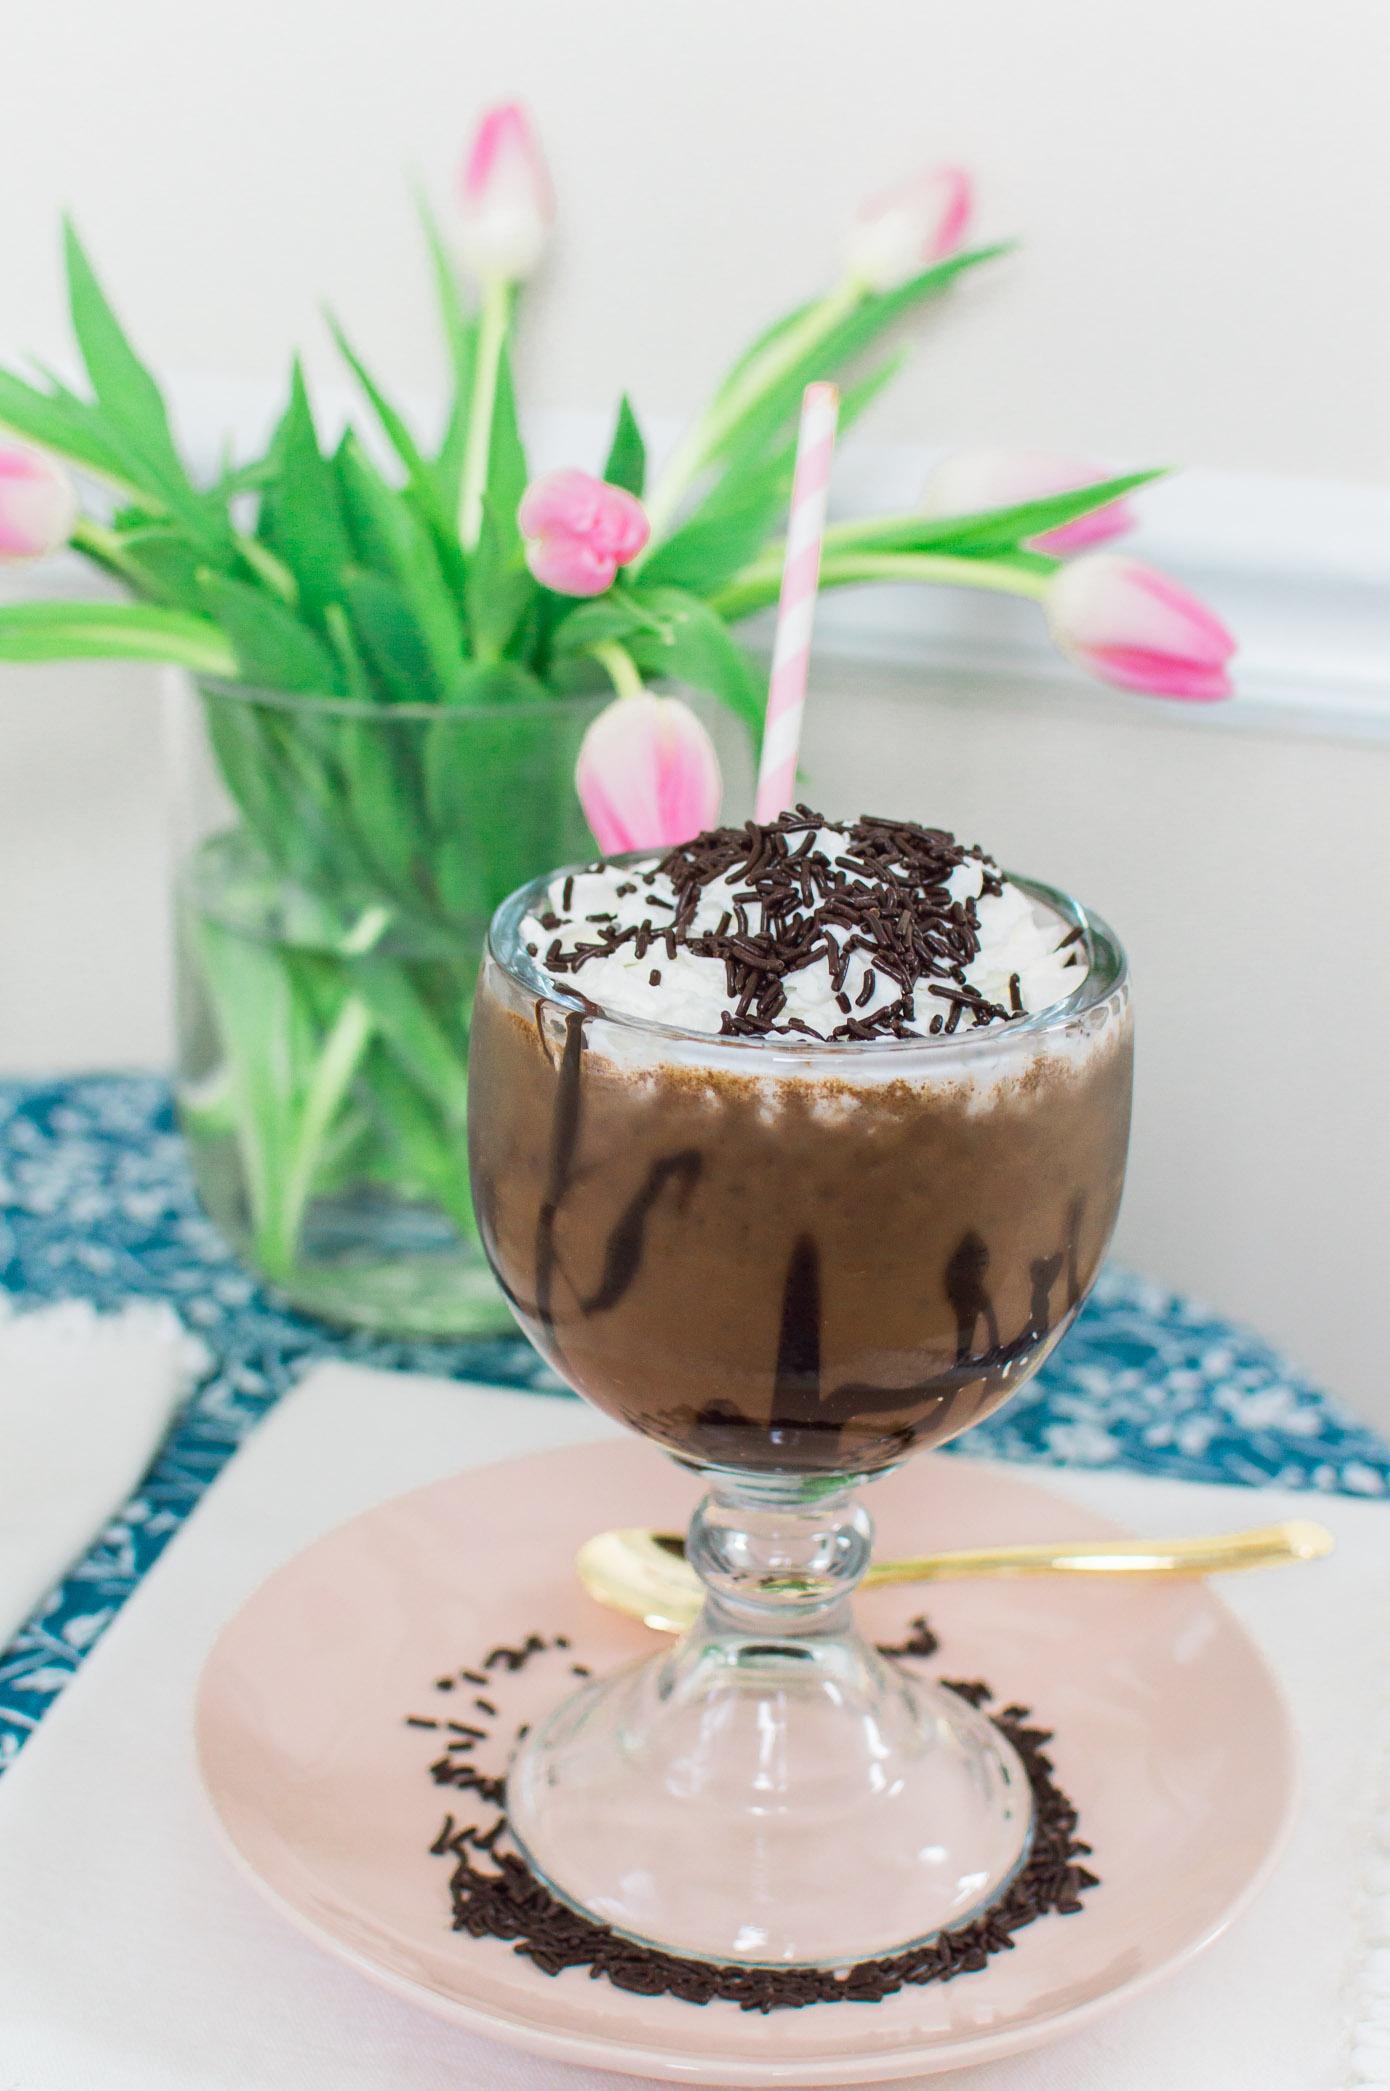 Homemade Frozen Hot Chocolate | Valentine's Day Dessert Idea | Louella Reese Life & Style Blog